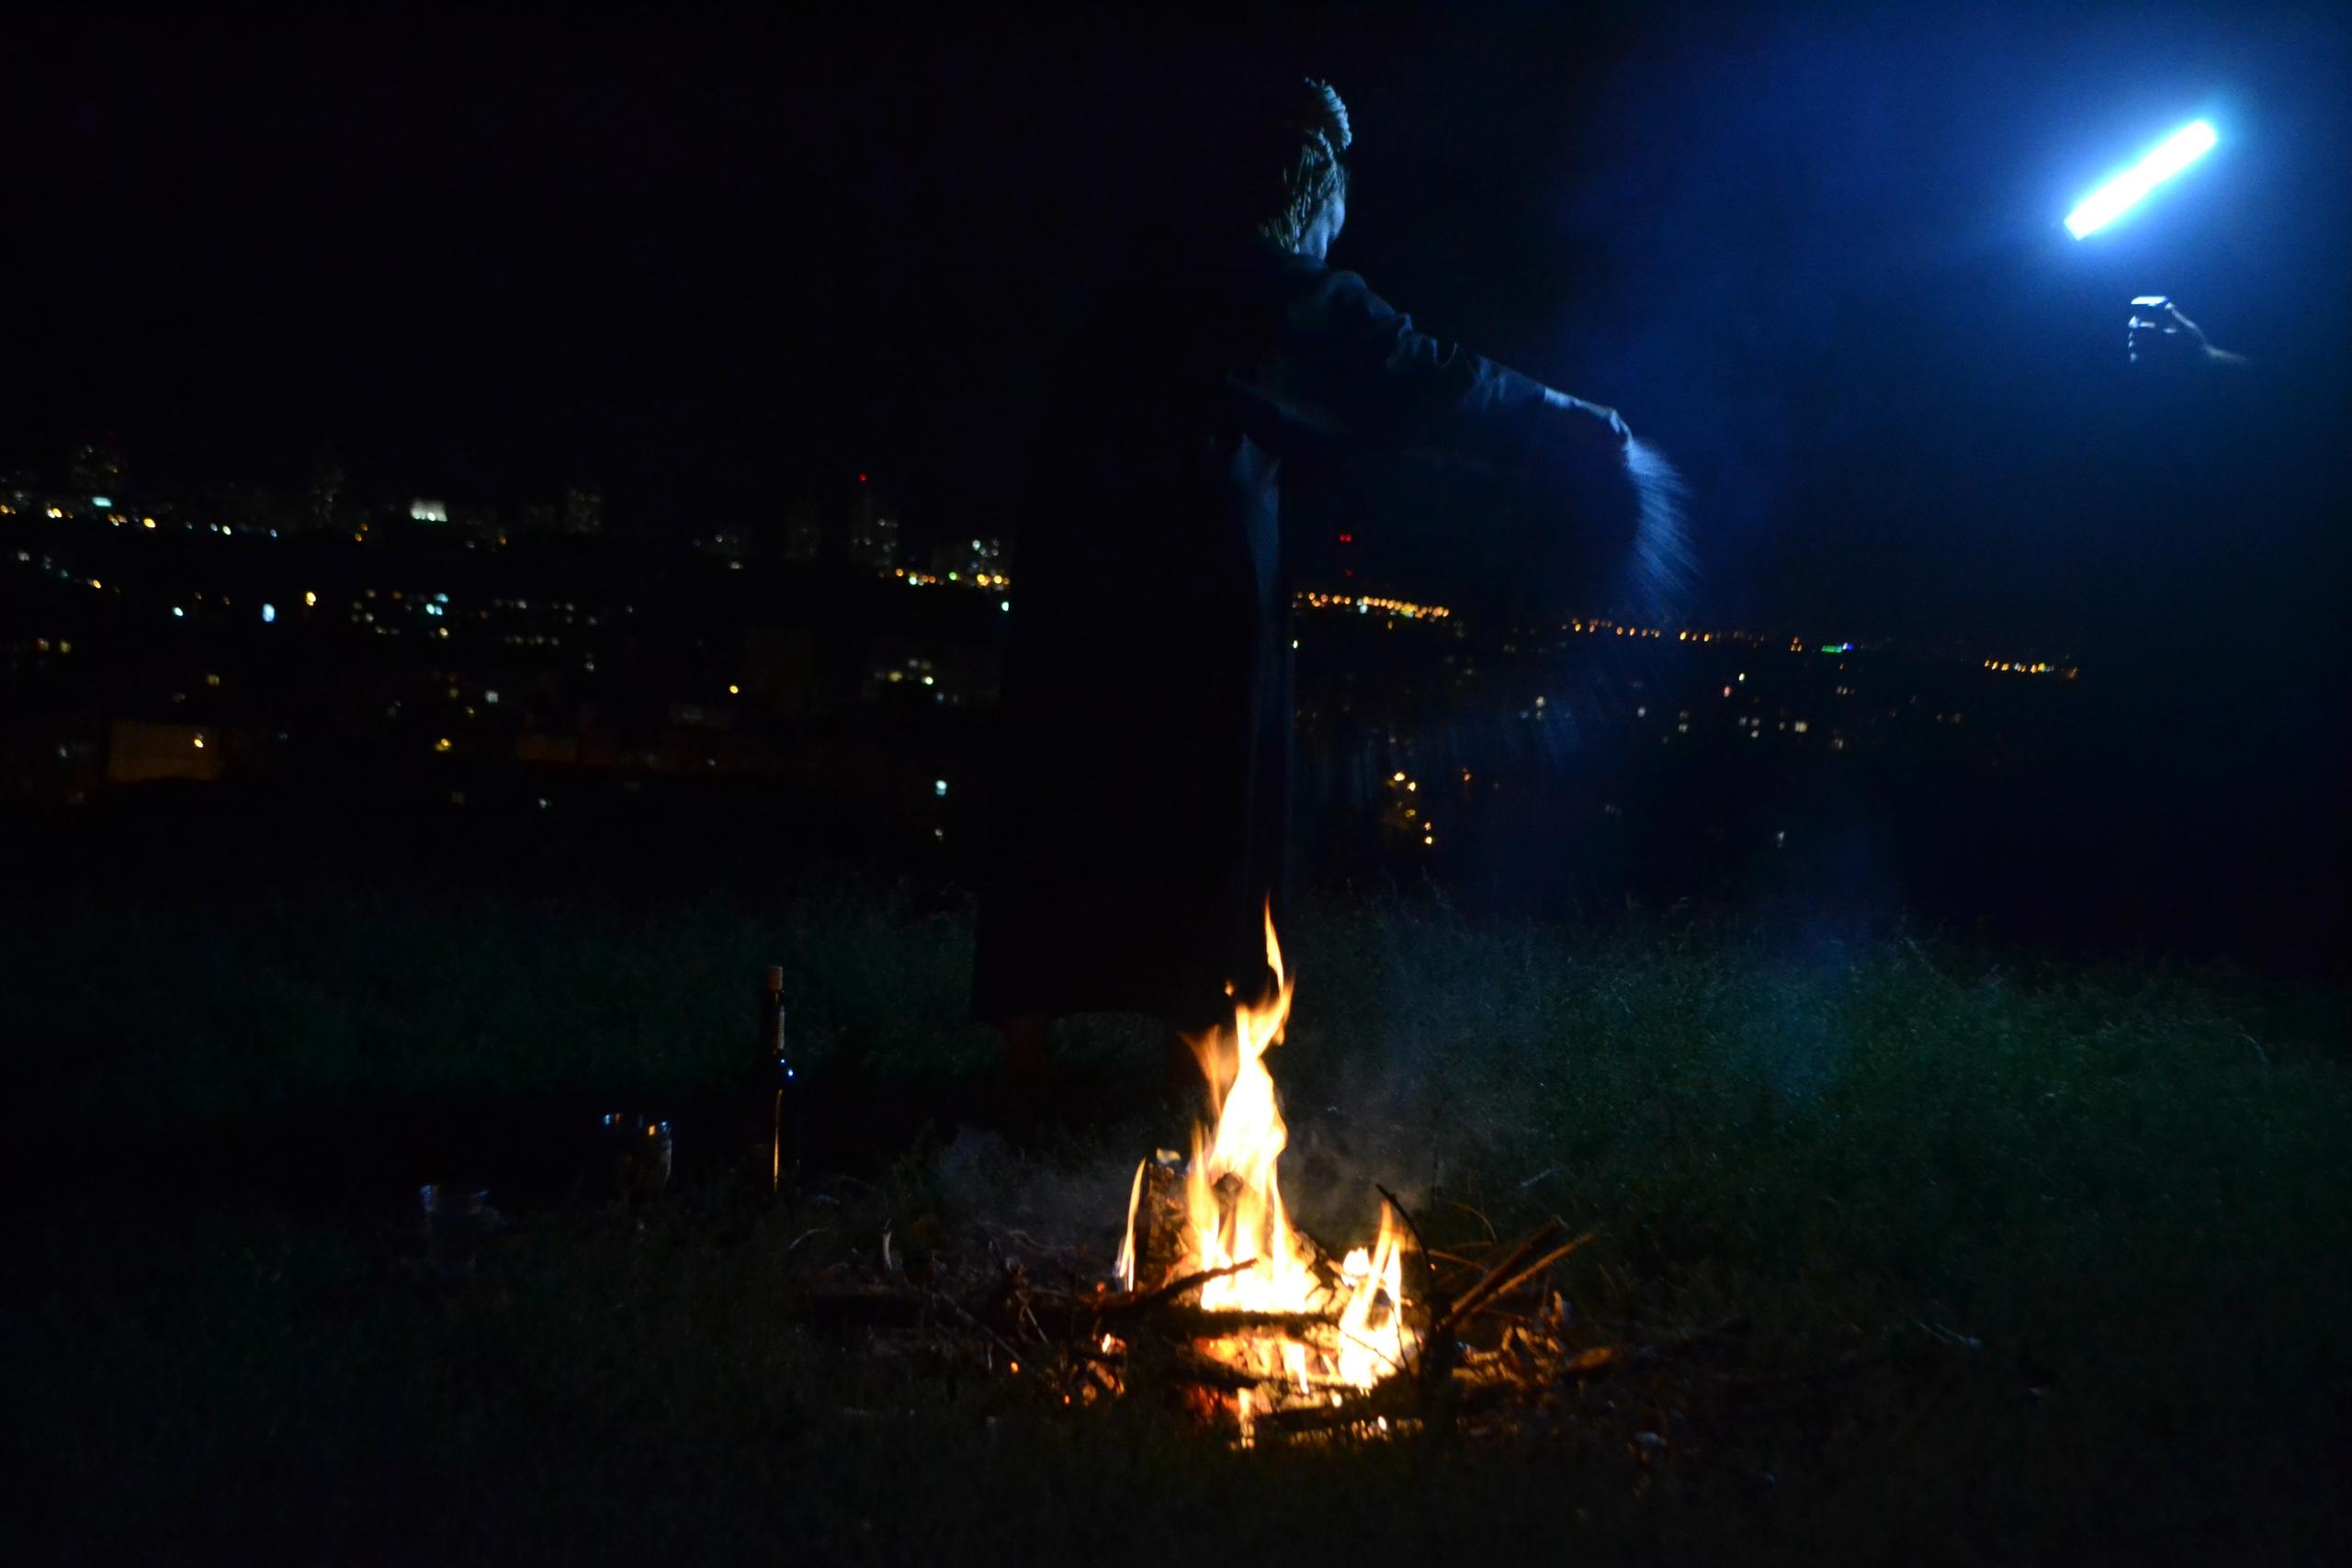 Елена Руденко (Валтея). Украина. Киев. Гора Щековица. Закрытый обряд. 2018 г . (ФОТО). BLMwqj28IxU